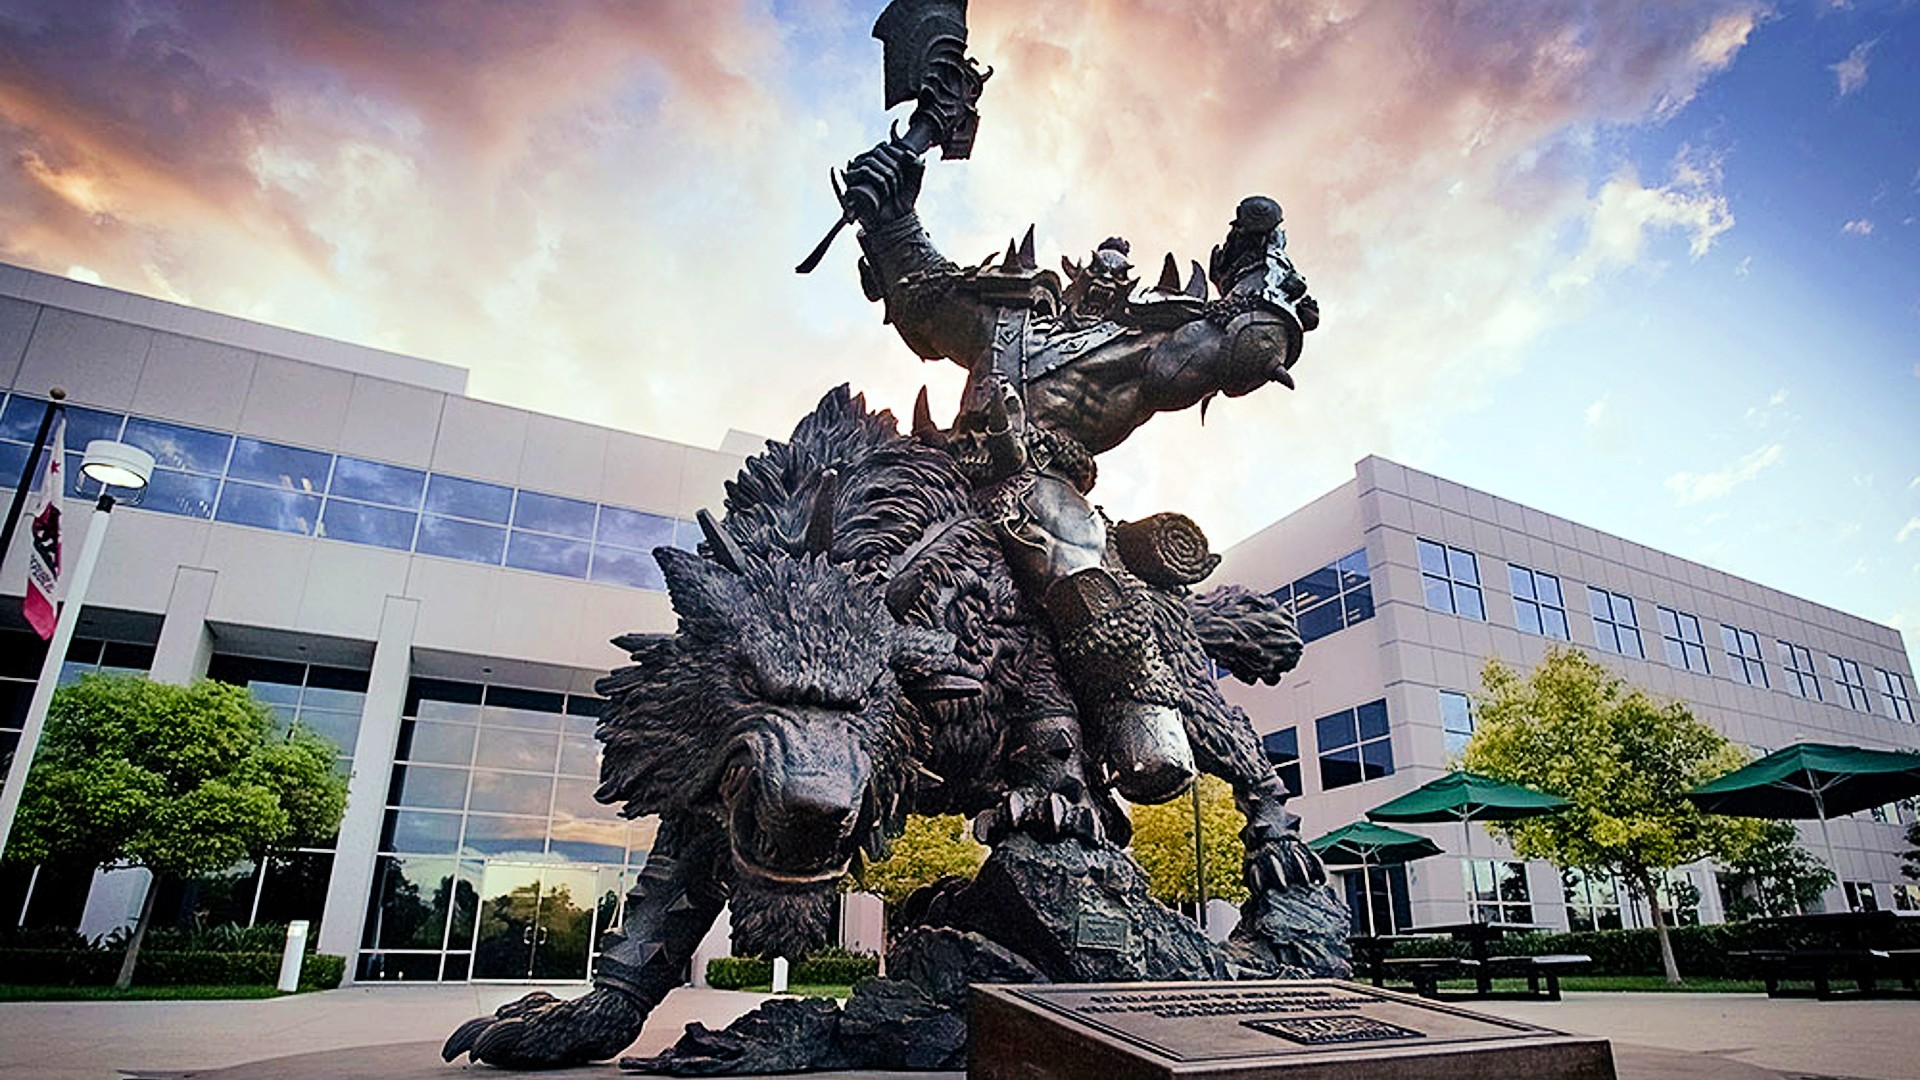 Activision Blizzard employees plan walkout